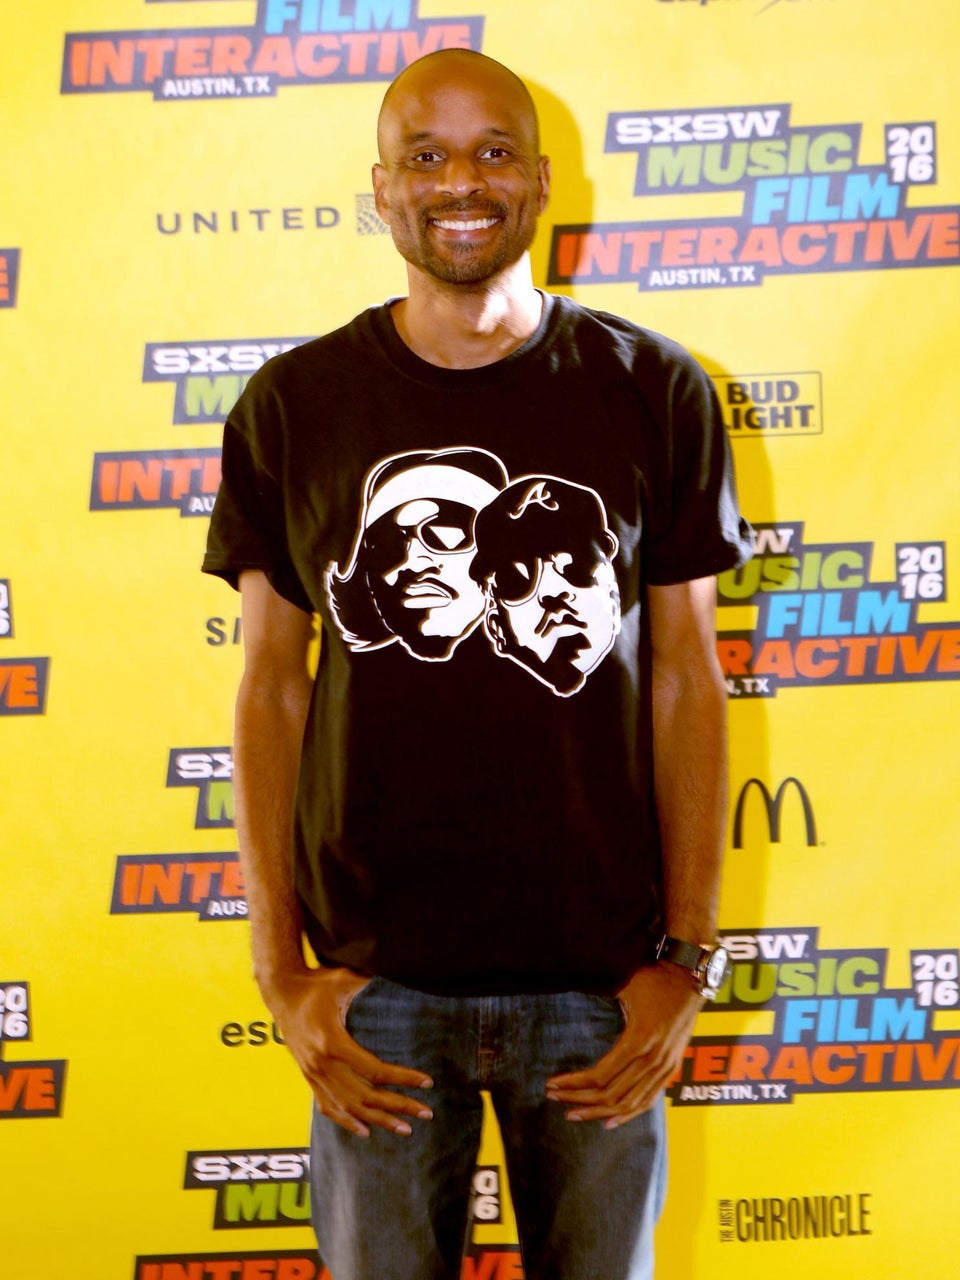 Bomani Jones Rocks 'Caucasians' Shirt on ESPN and Twitter Can't Handle It